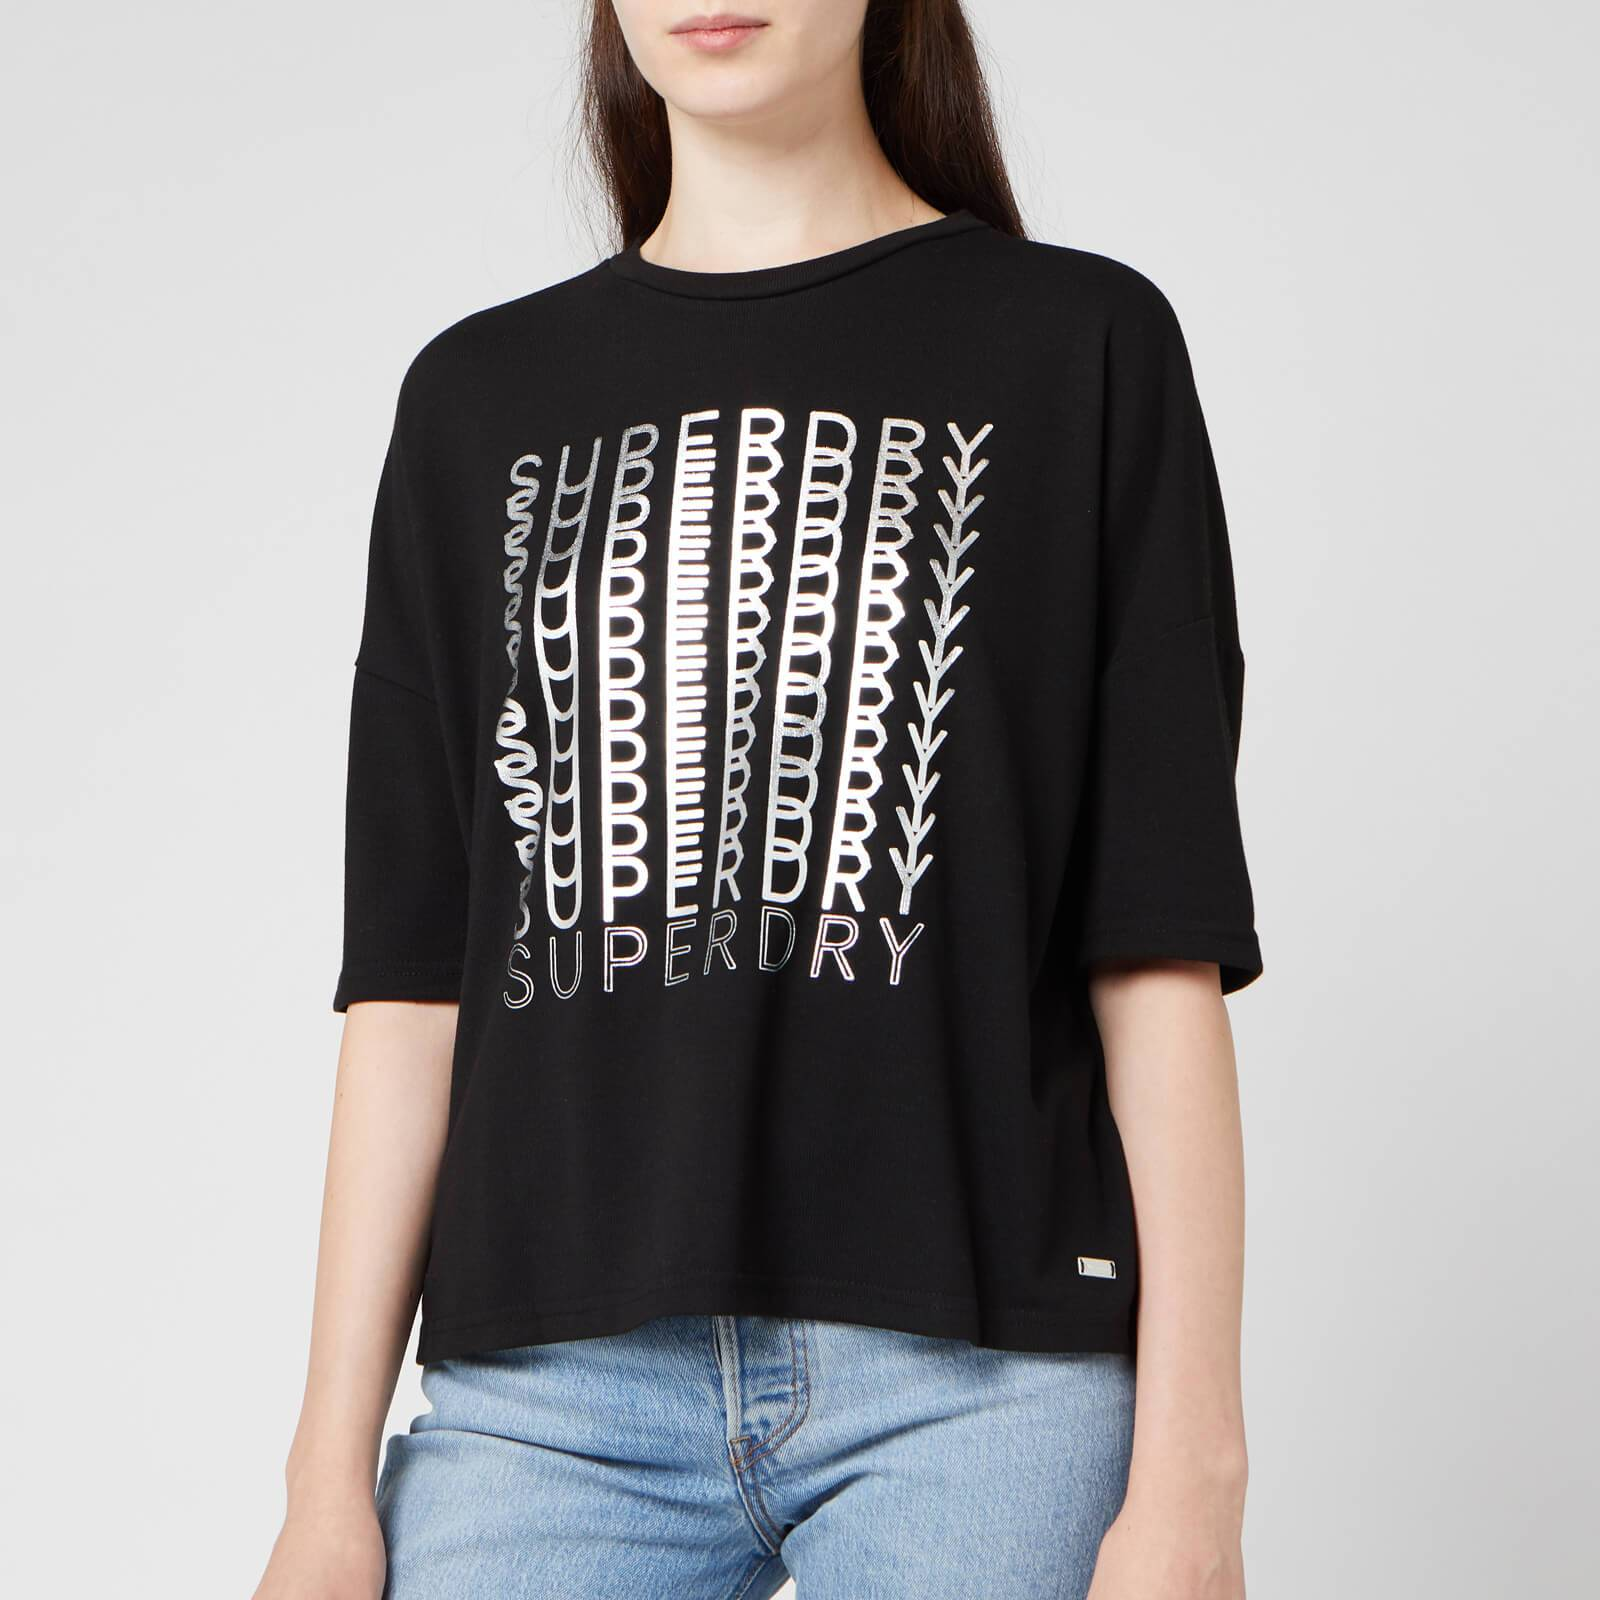 Superdry Women's Foil Graphic T-Shirt - Black - UK 14